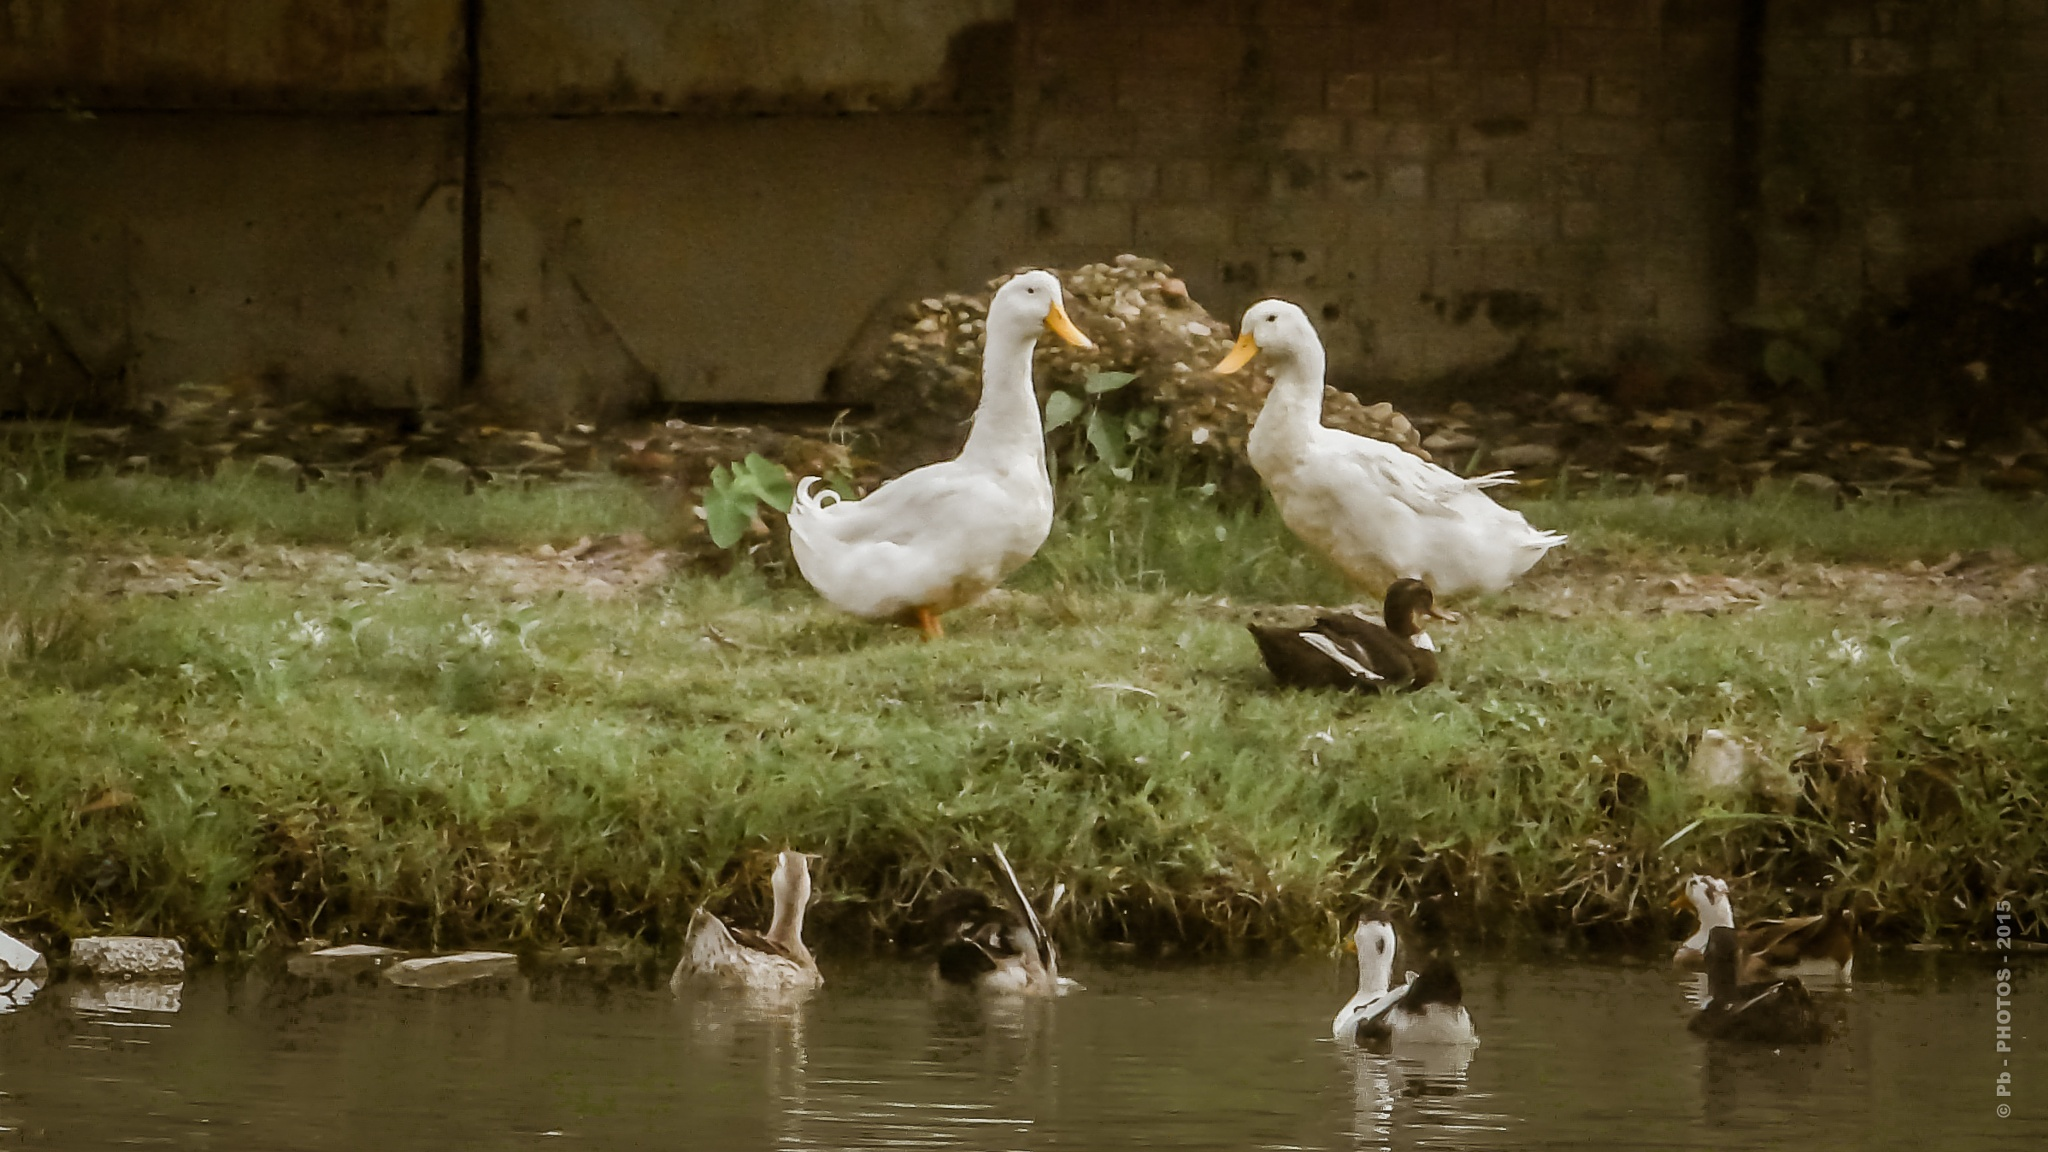 319 - Duck Family - Animal by Pb - PHOTOS